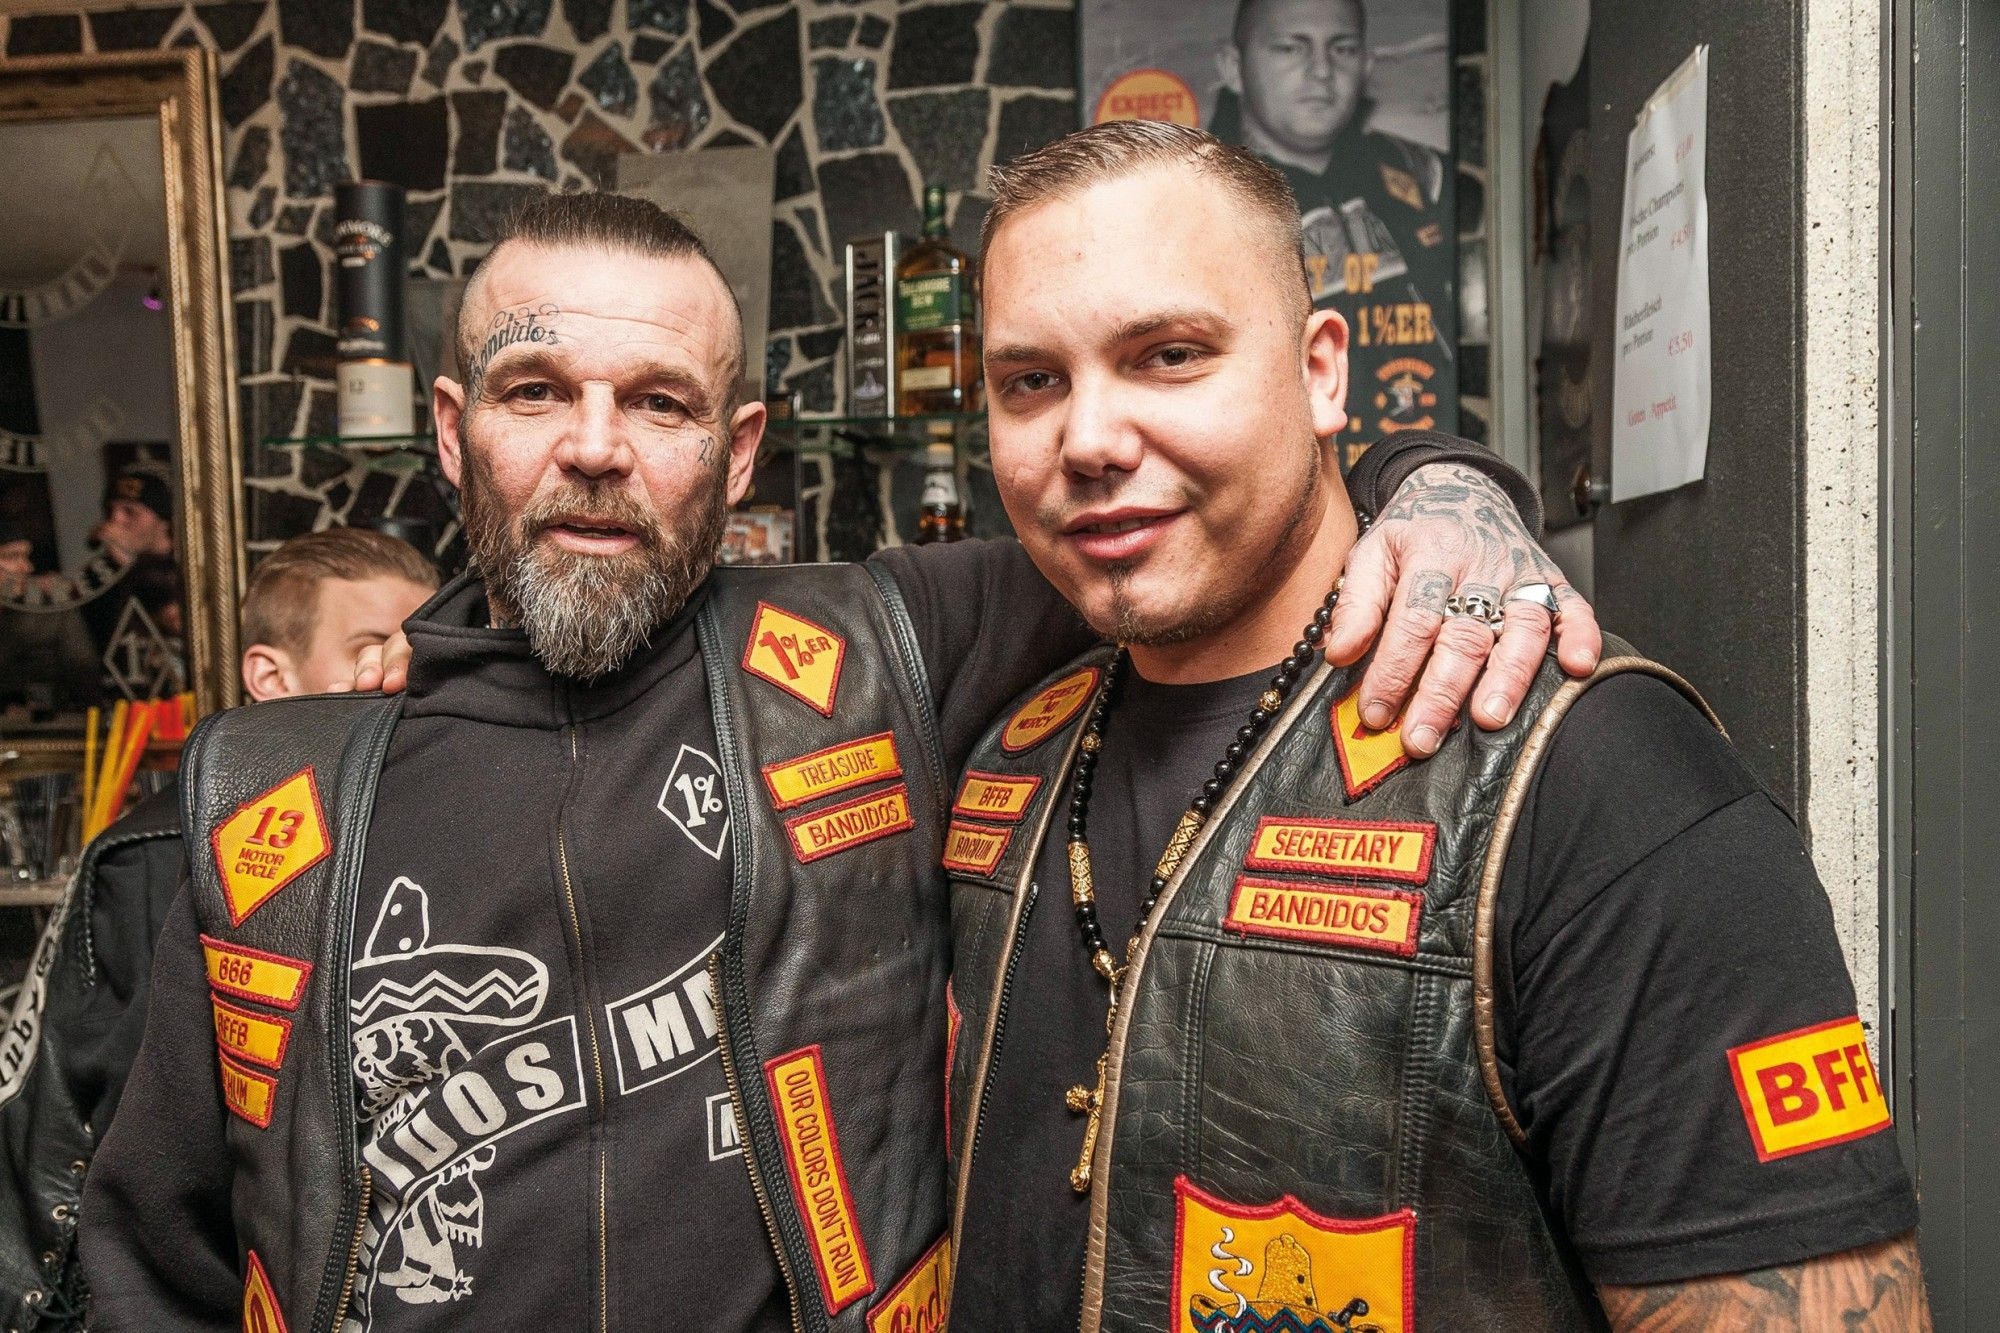 Bandidos MC Bochum | Bandidos MC | Motorcycle clubs, Biker clubs et